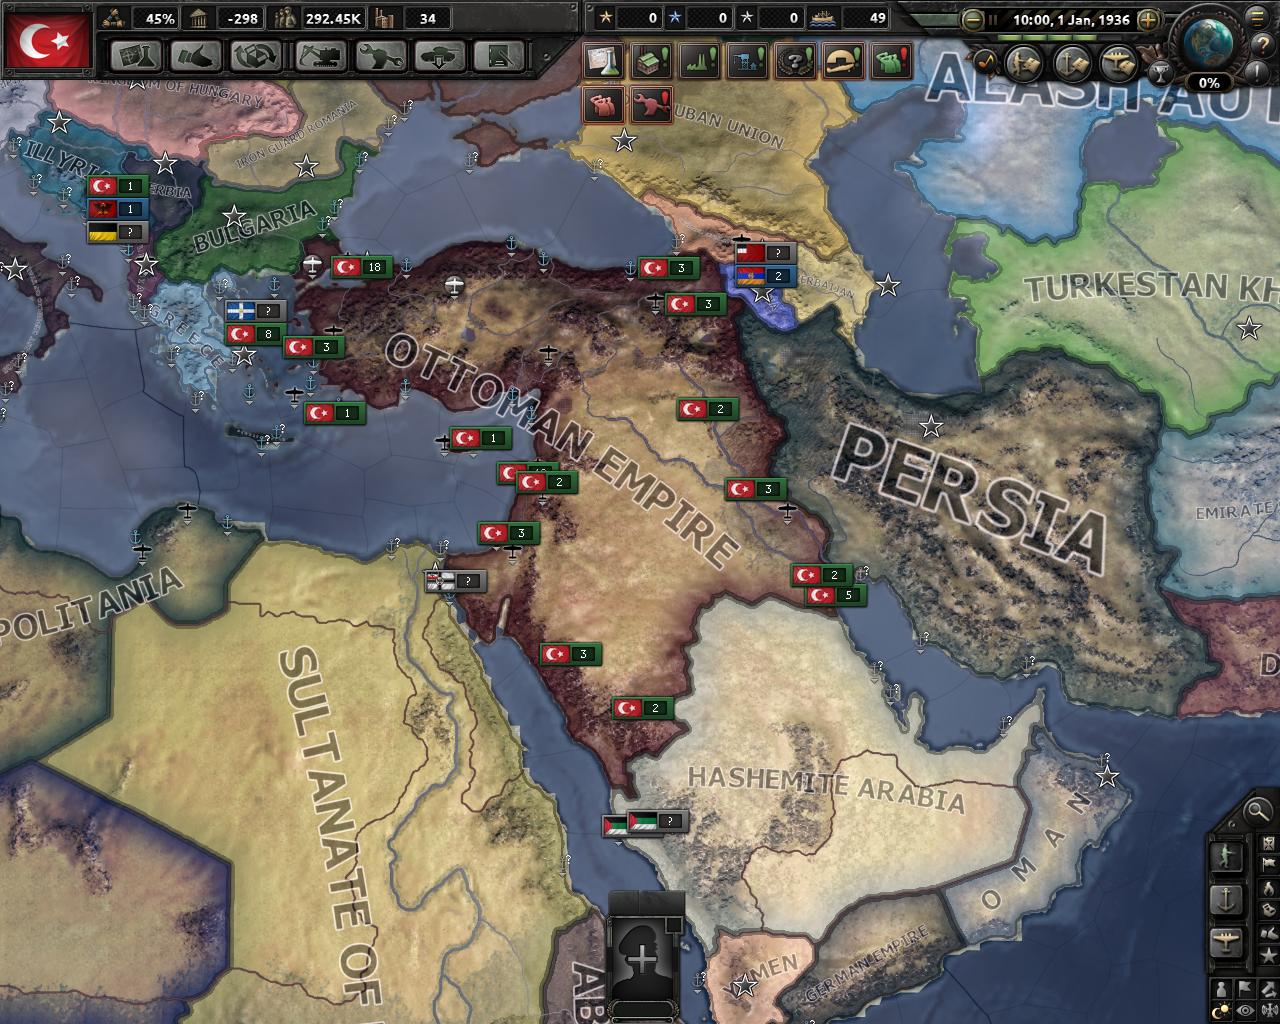 The Ottoman Empire Strikes Back on Kaiserreich | Paradox